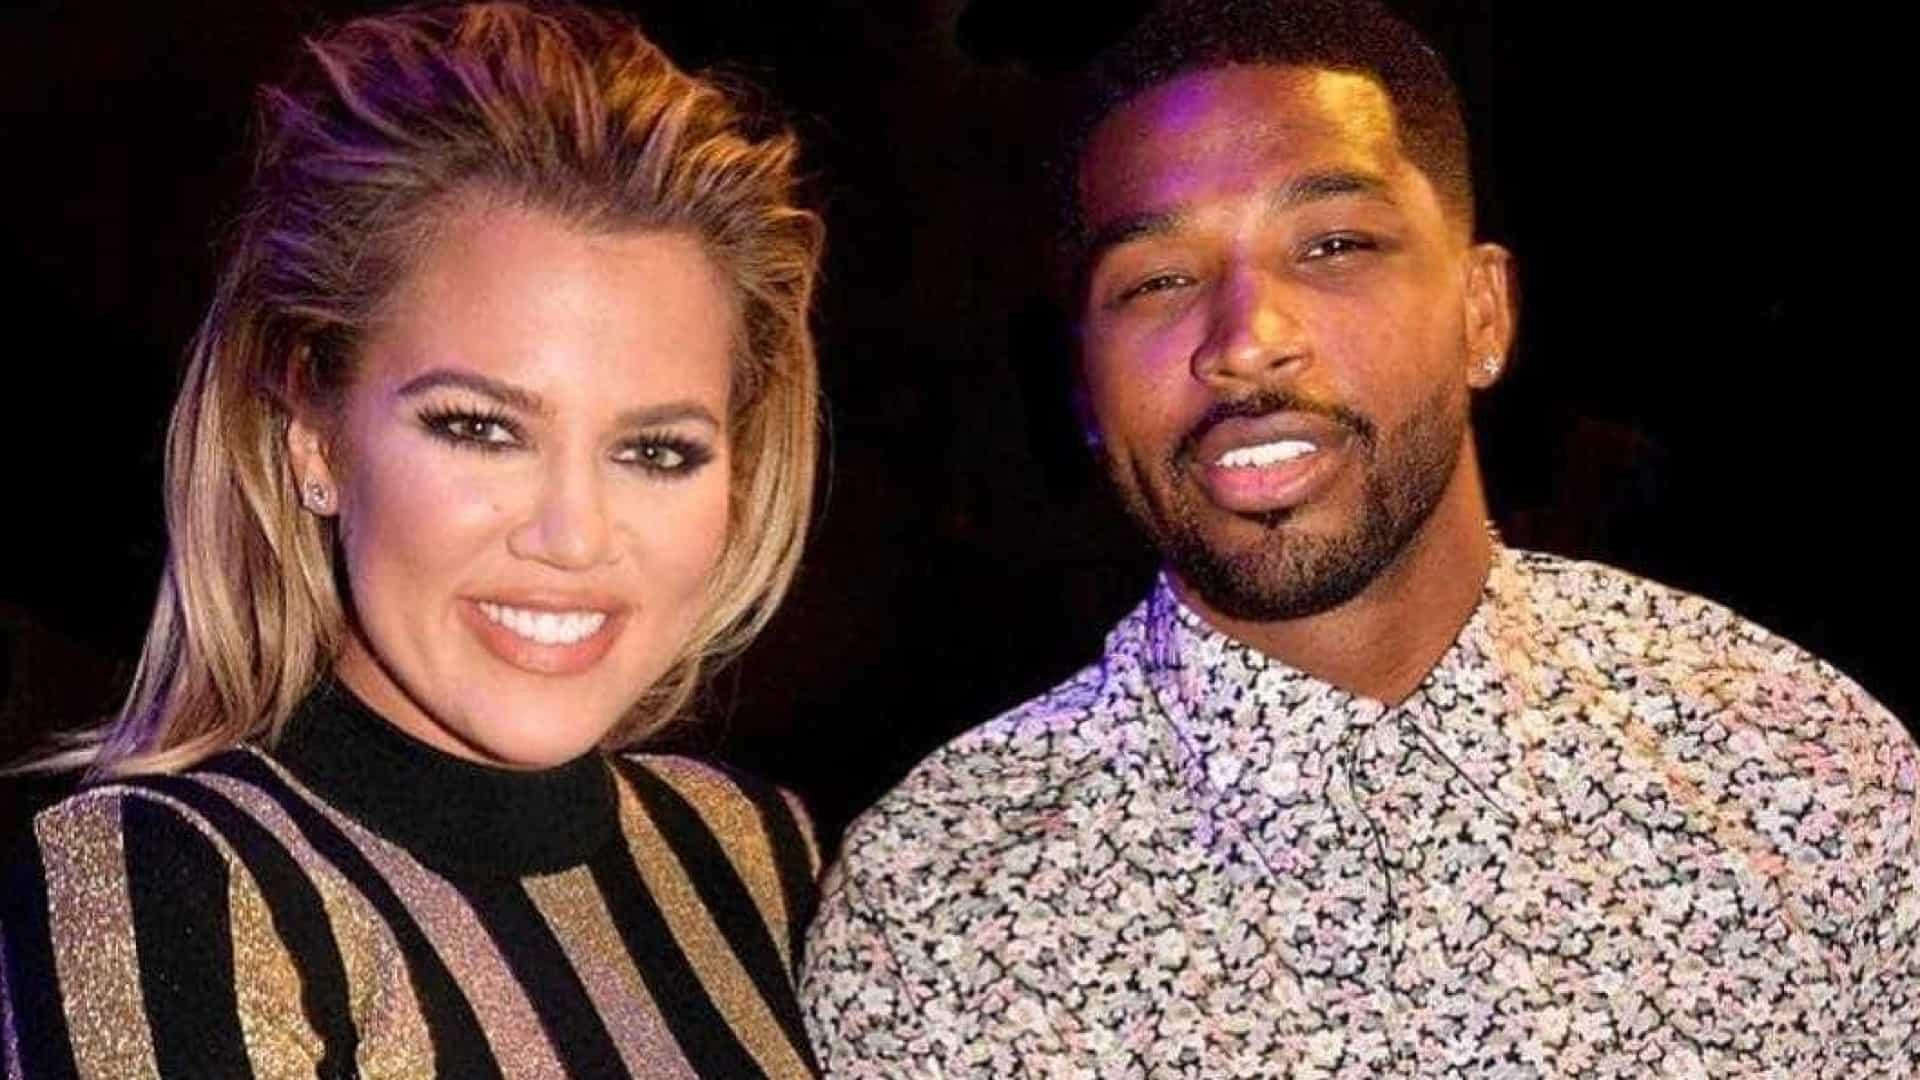 Tristan Thompson reage ao novo look de Khloé Kardashian